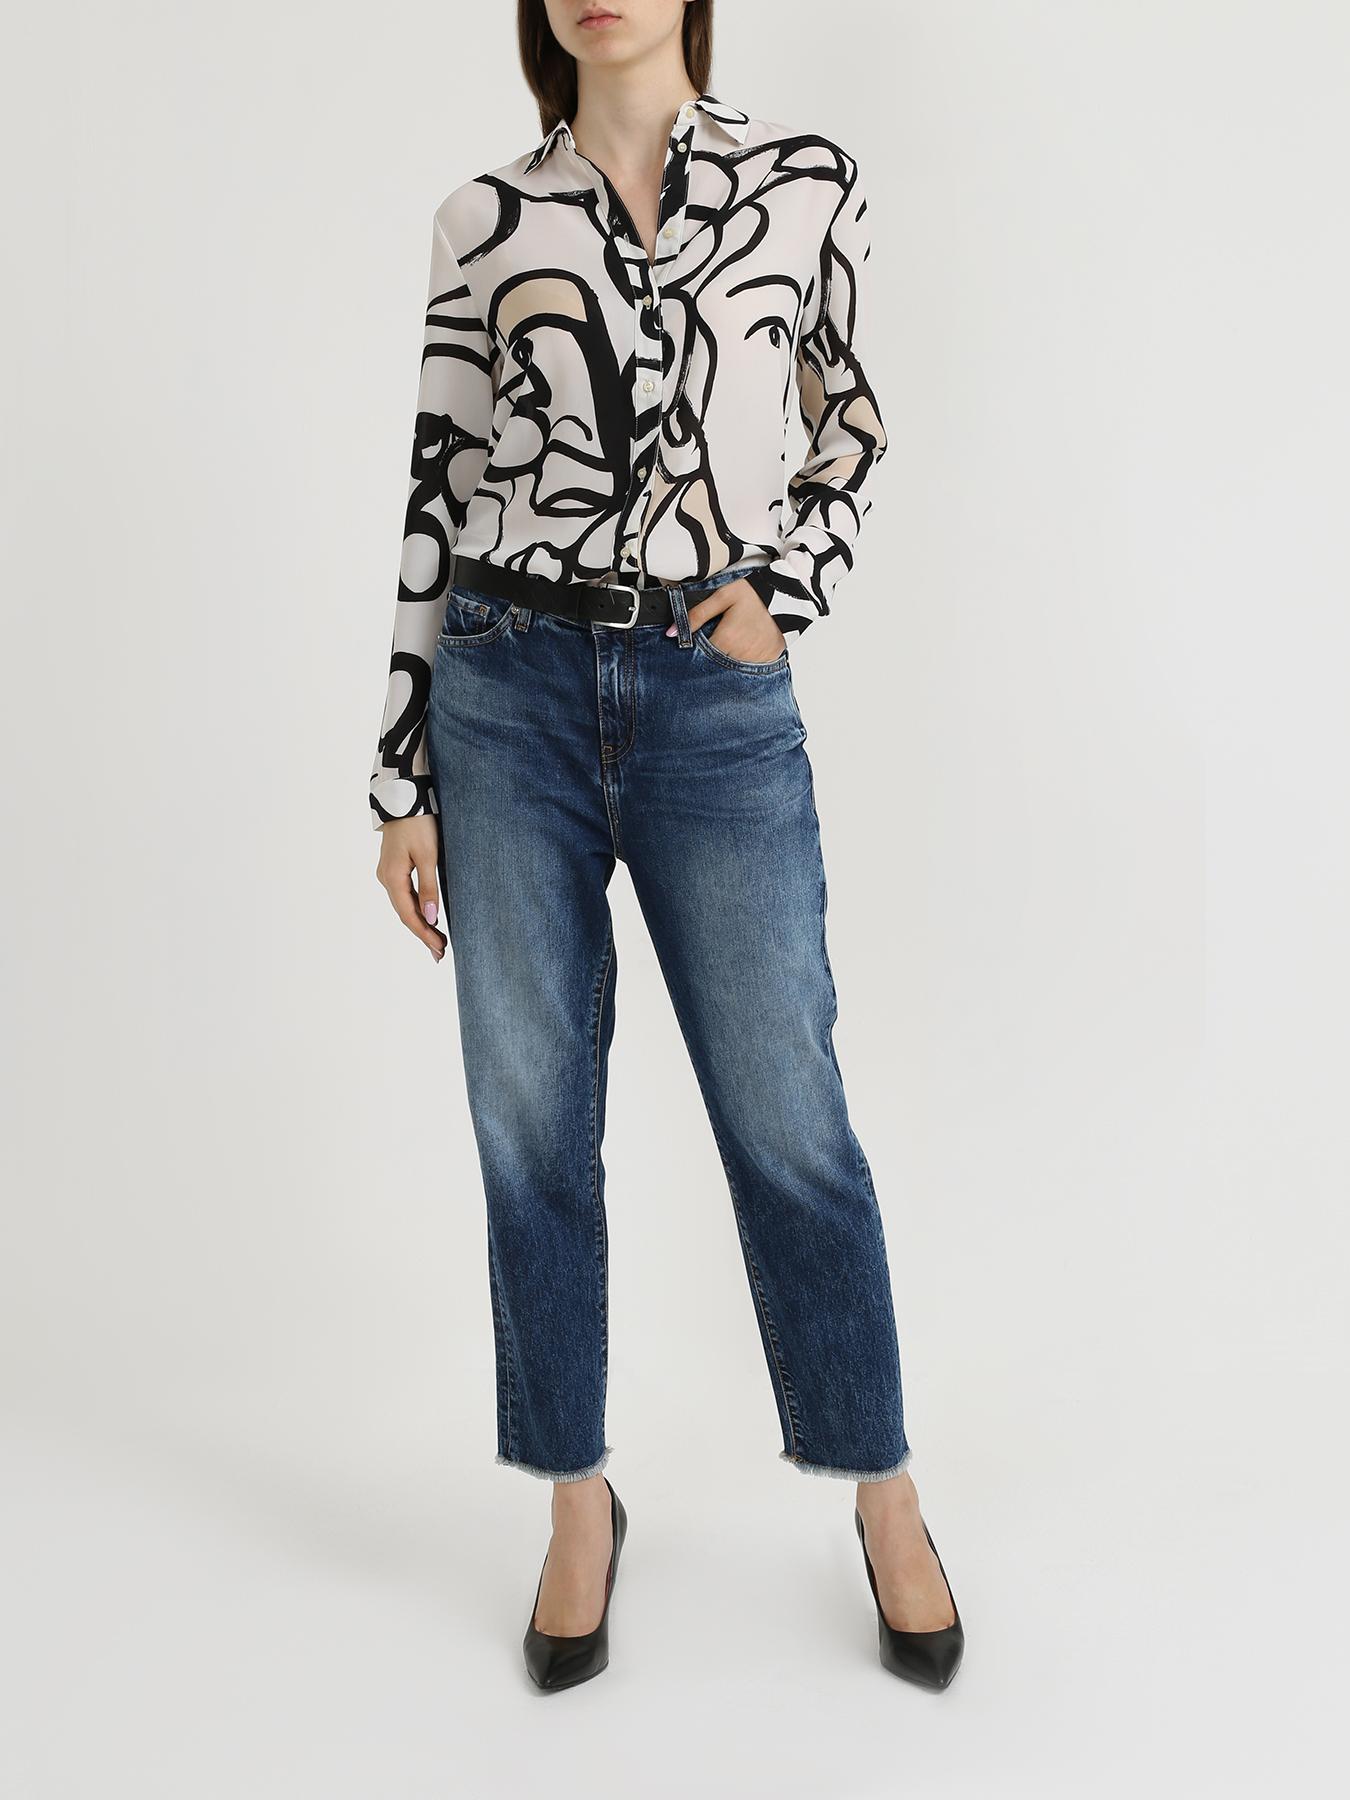 Armani Exchange Женская блузка с рисунками 353109-044